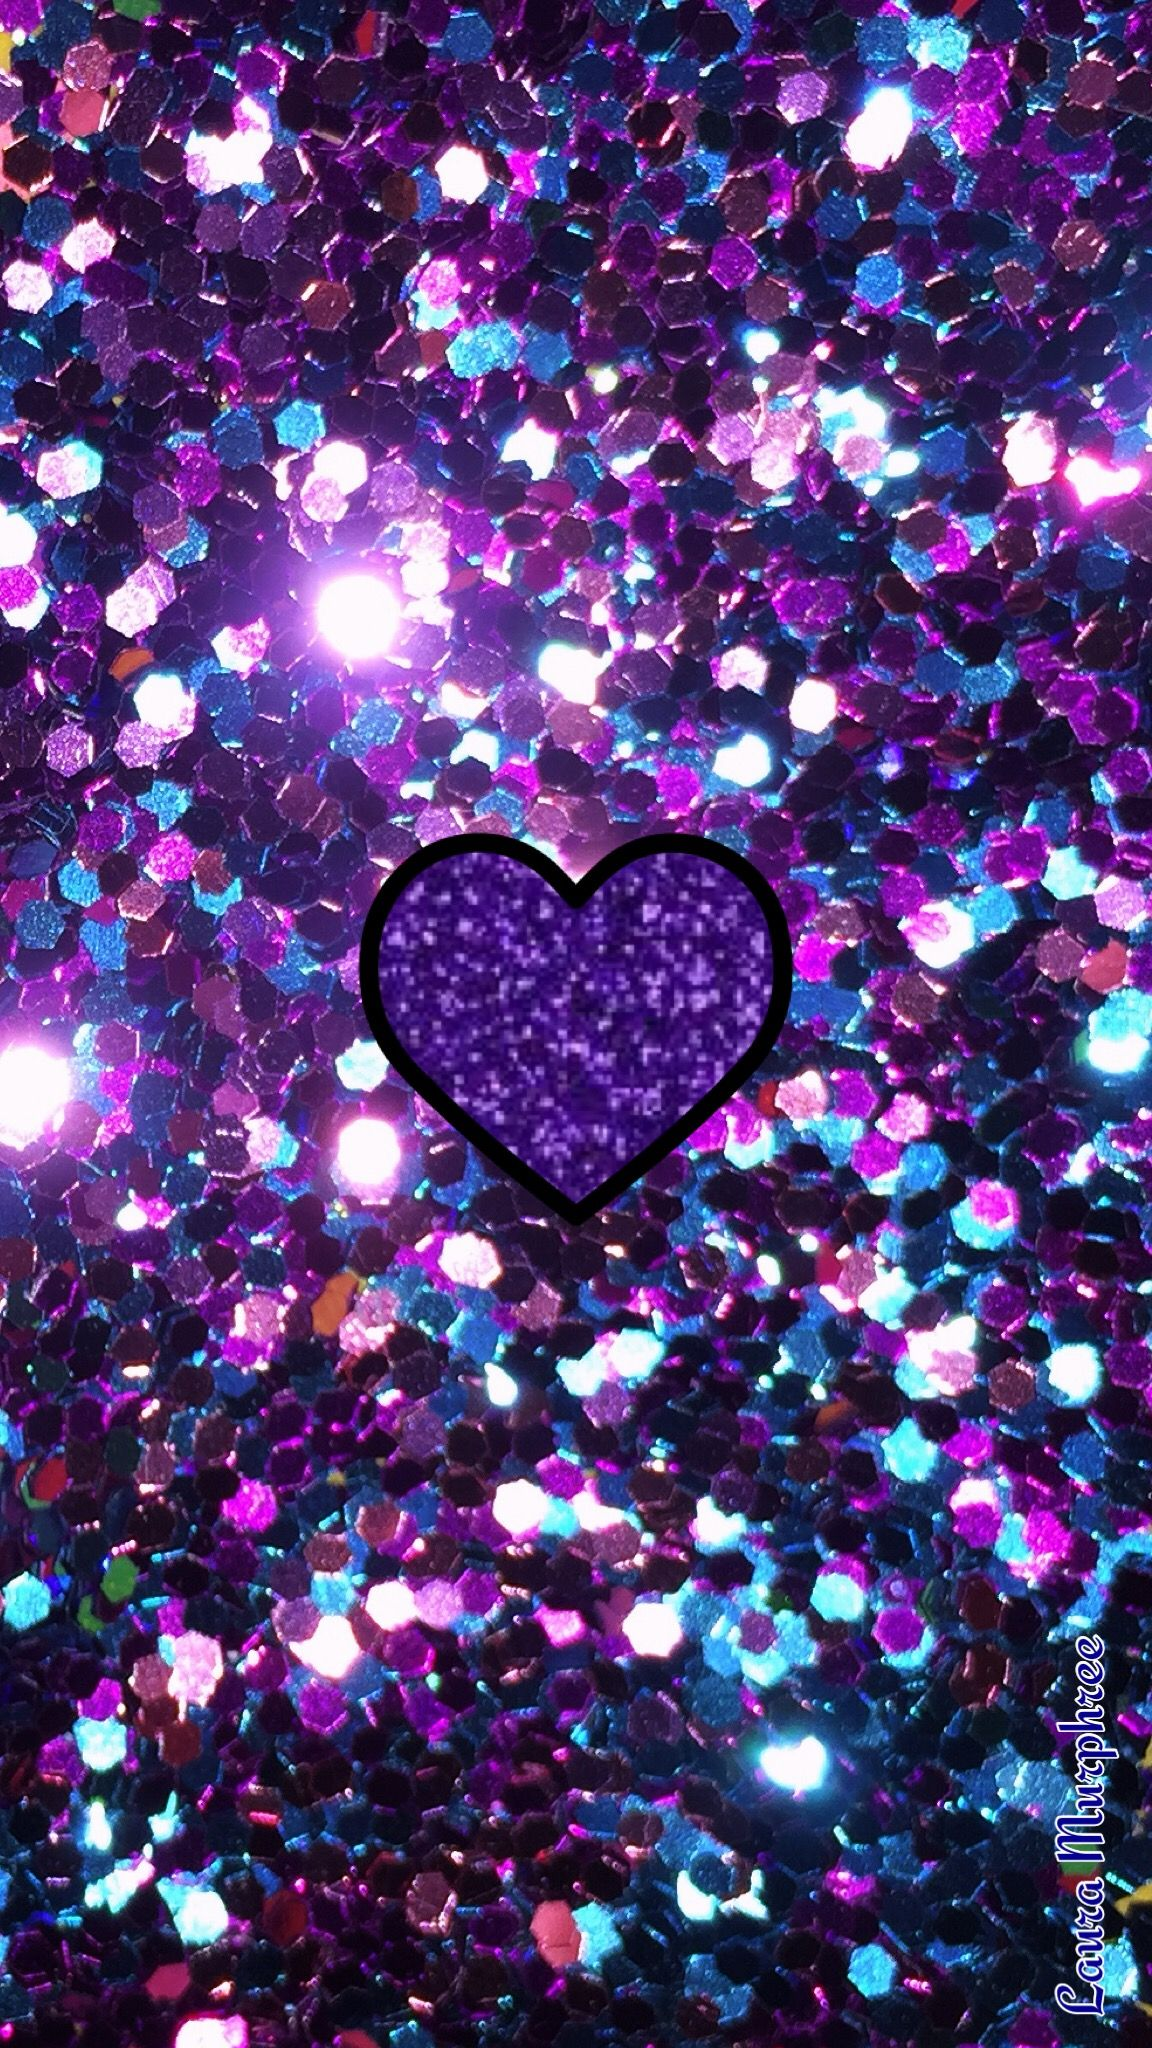 Glitter Phone Wallpaper Sparkle Background Sparkling Background Bling Shimmer Sparkles Glitter Glittery Colorful Heart Blue Purple